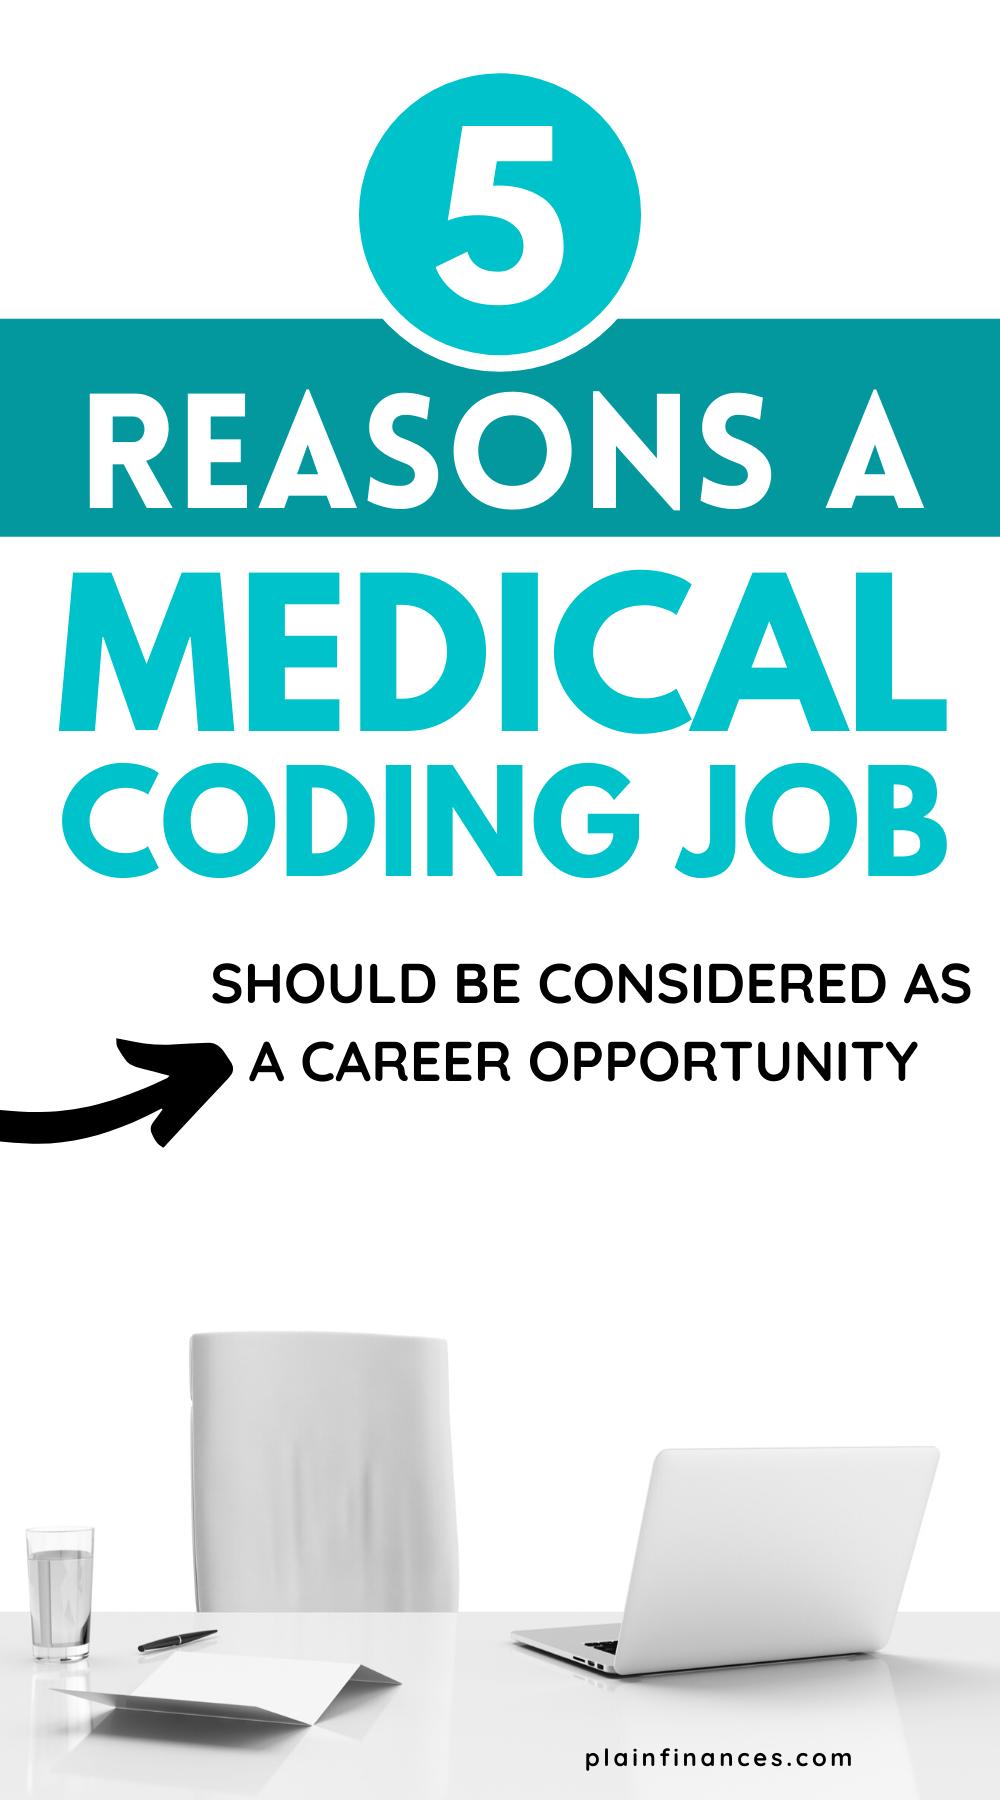 216e90850e9a1e7b18ee6255b15abbdc - How Hard Is It To Get A Medical Coding Job